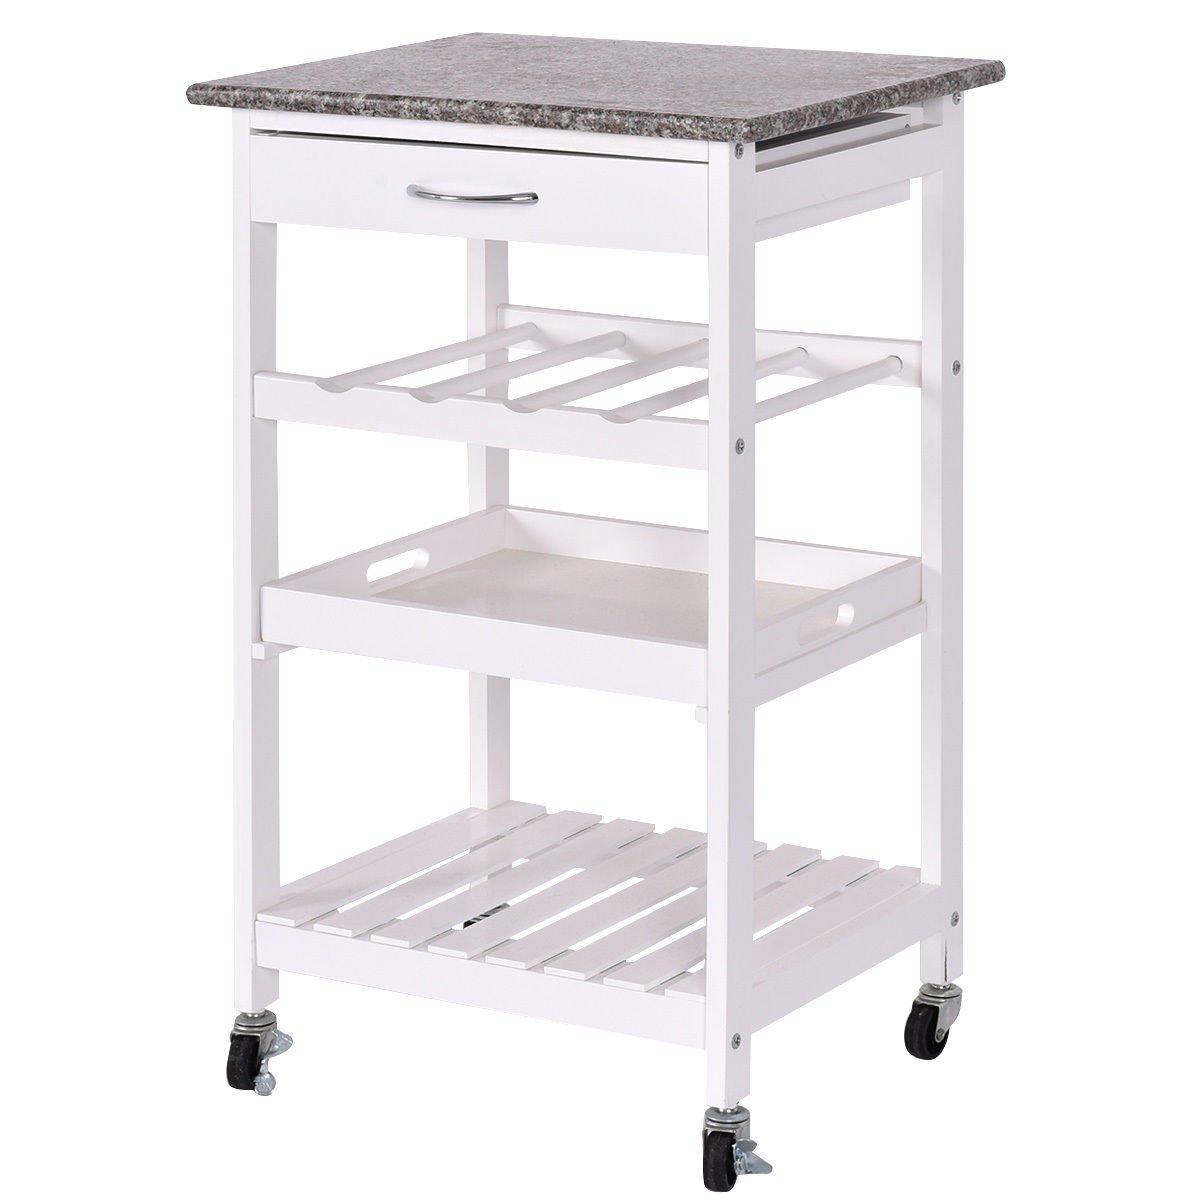 Giantex 4-Tier Rolling Wood Kitchen Trolley Island Cart Storage Shelf Drawer Wine Rack